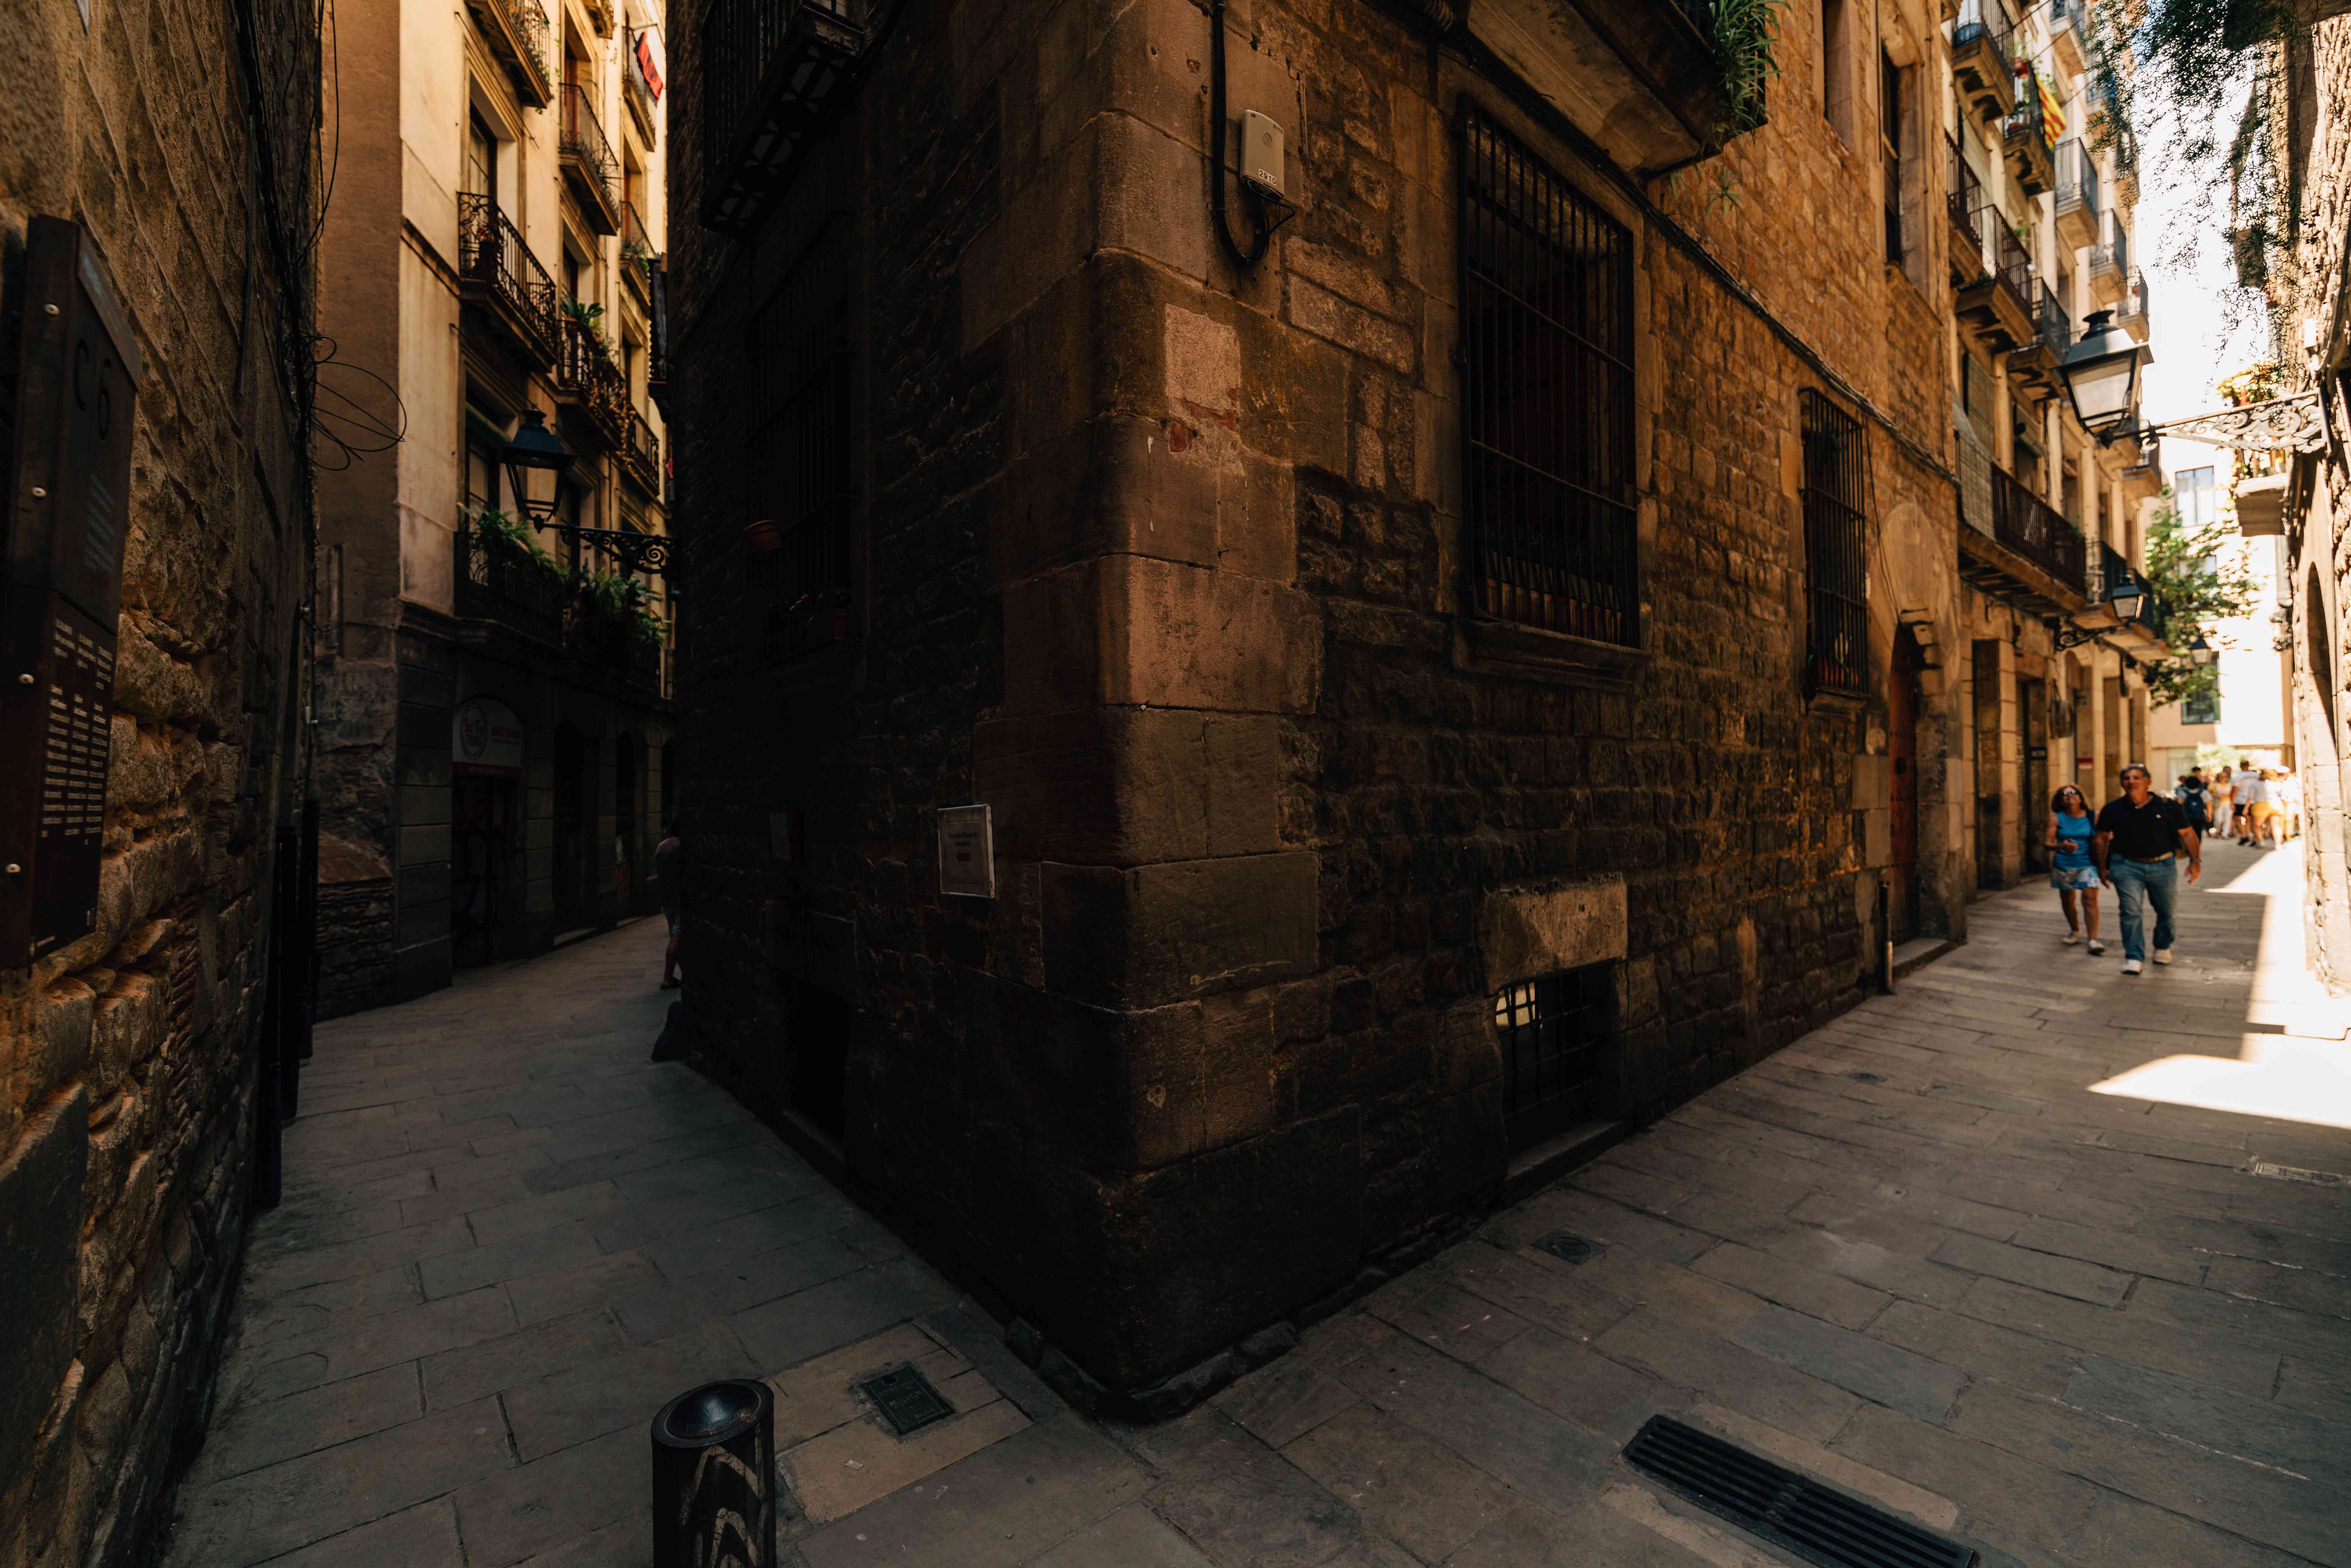 Alleyways in Barcelona